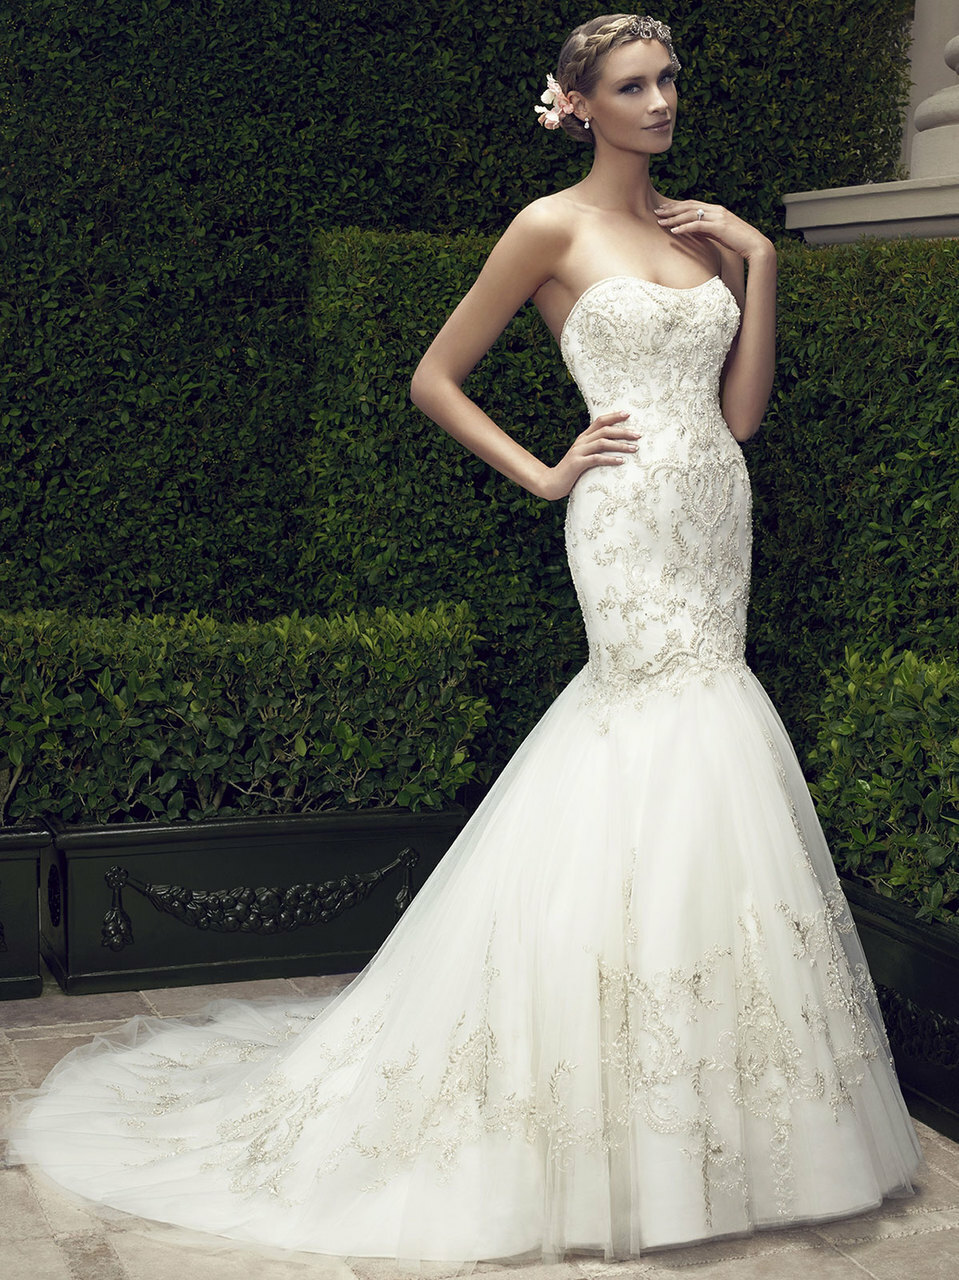 Casablanca Mermaid Wedding Dresses with Bling